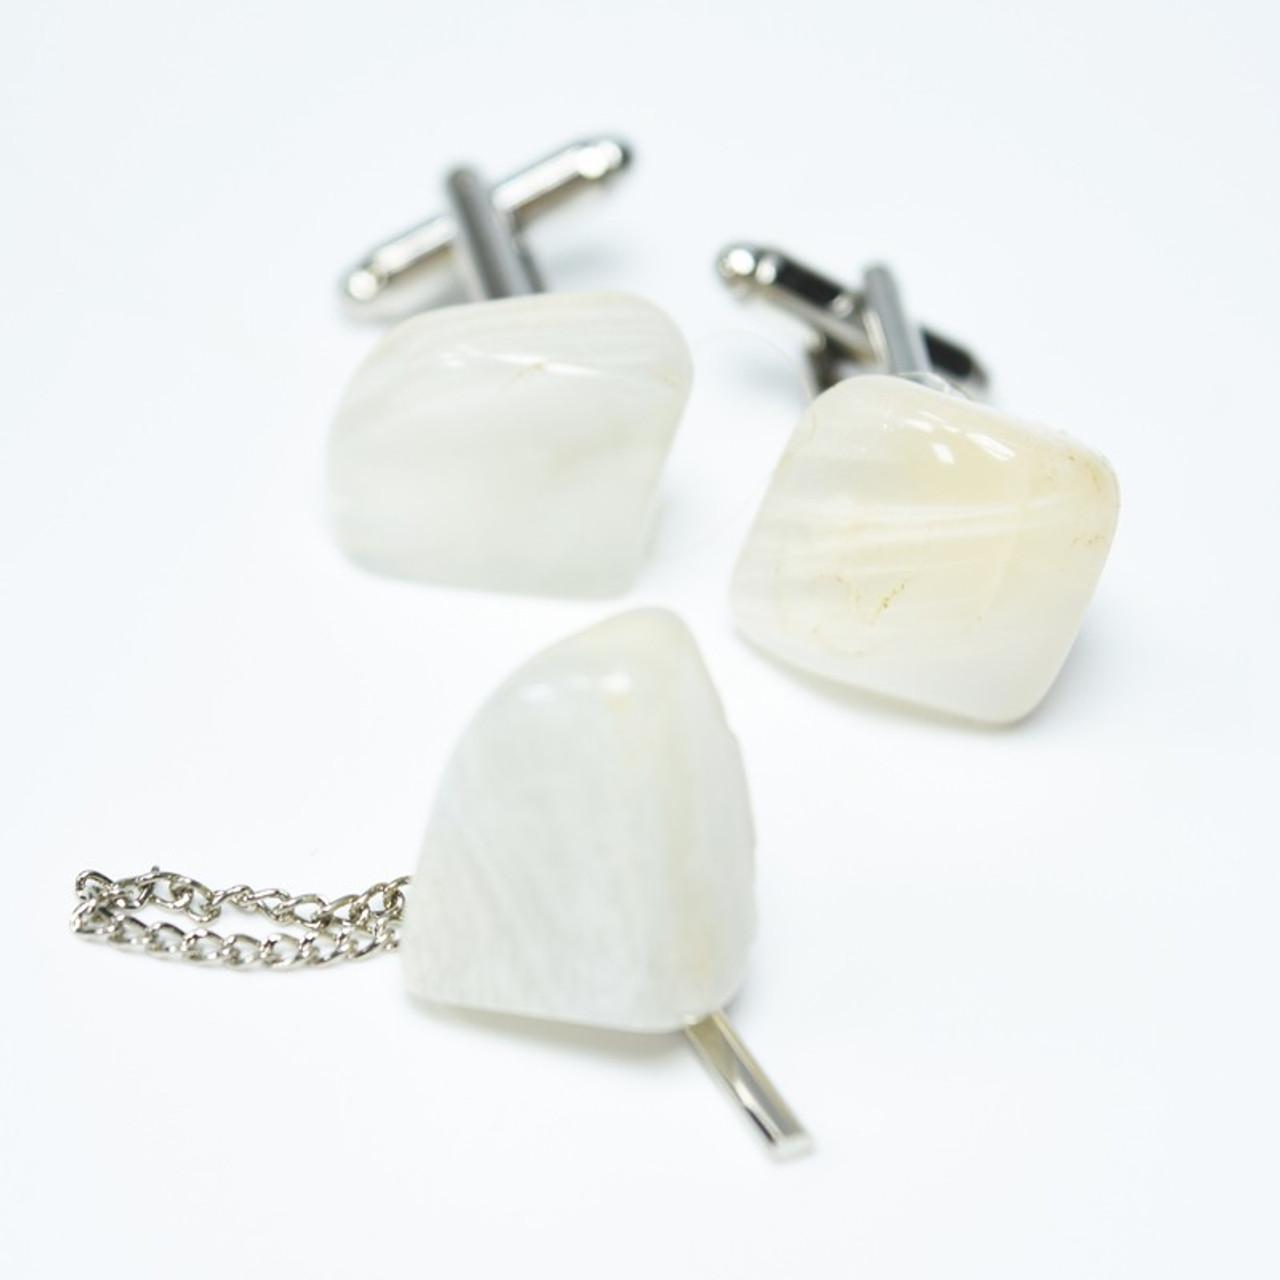 Moonstone Cufflinks and Tie Tack Set